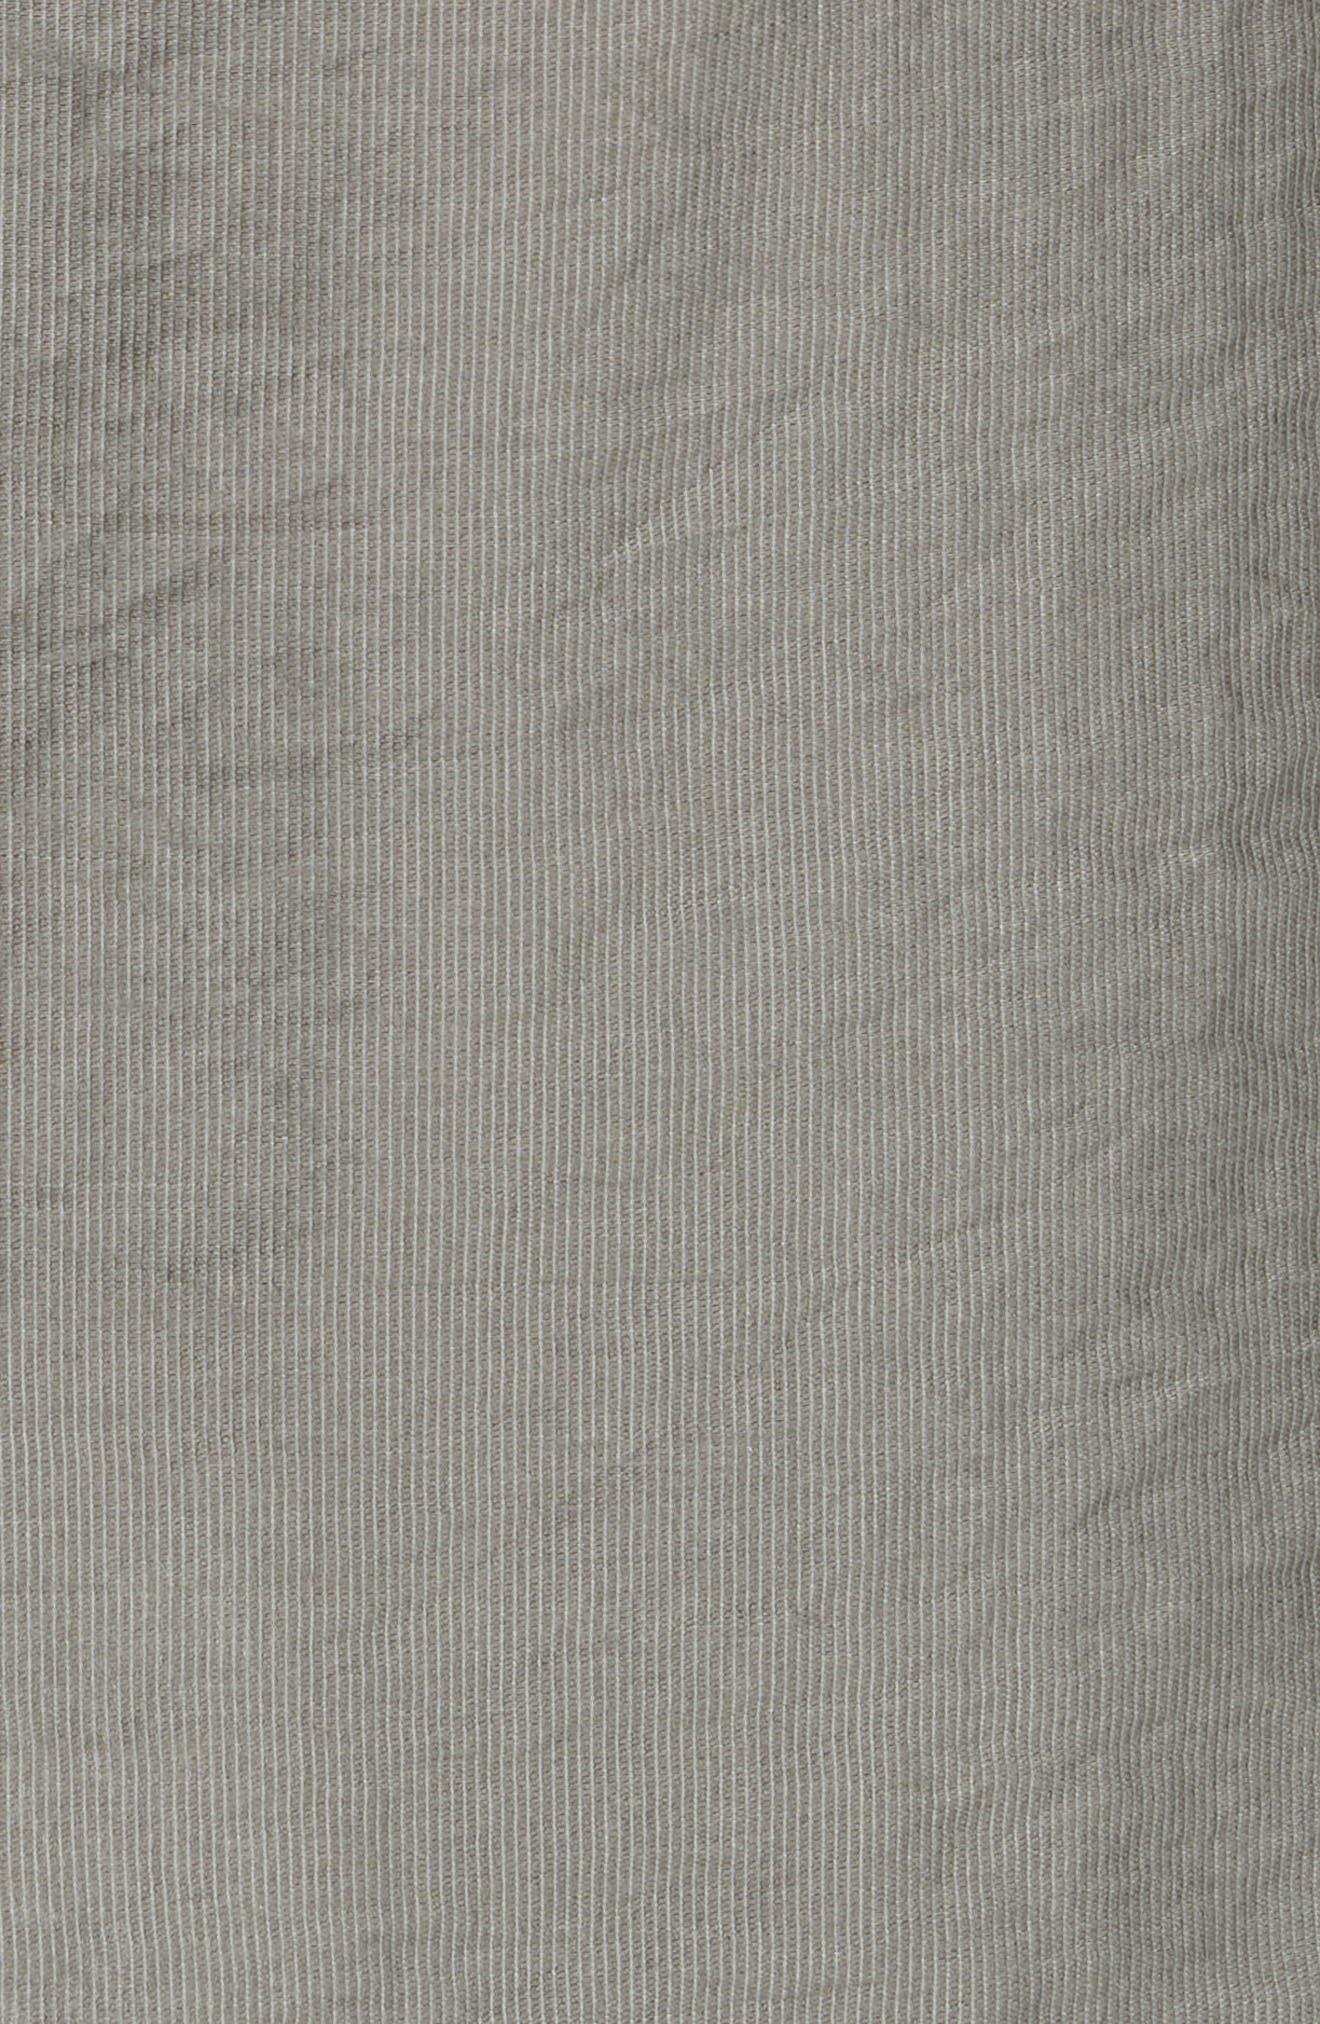 Erlecia Wrap Skirt,                             Alternate thumbnail 6, color,                             Moss